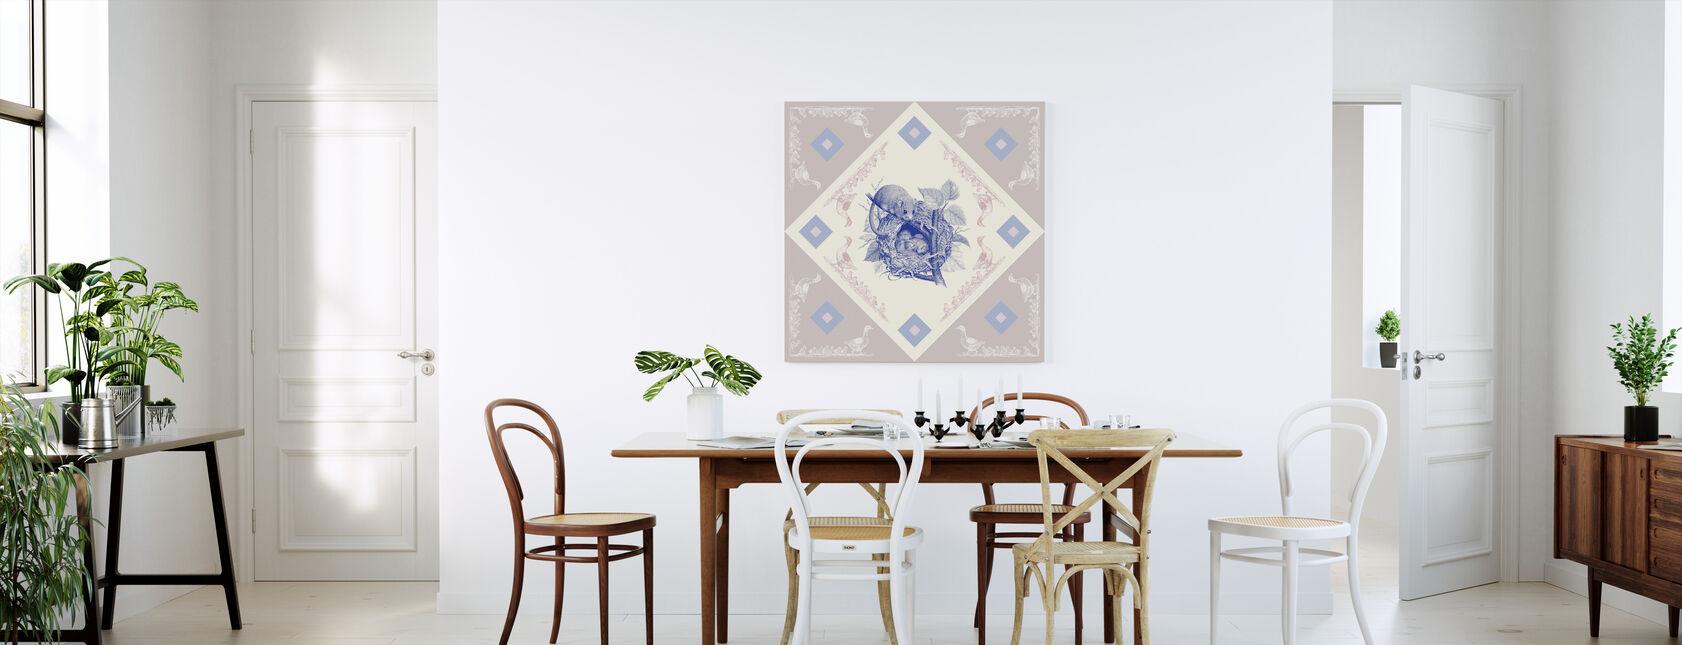 Dormouse, Blå Rosa - Canvastavla - Kök